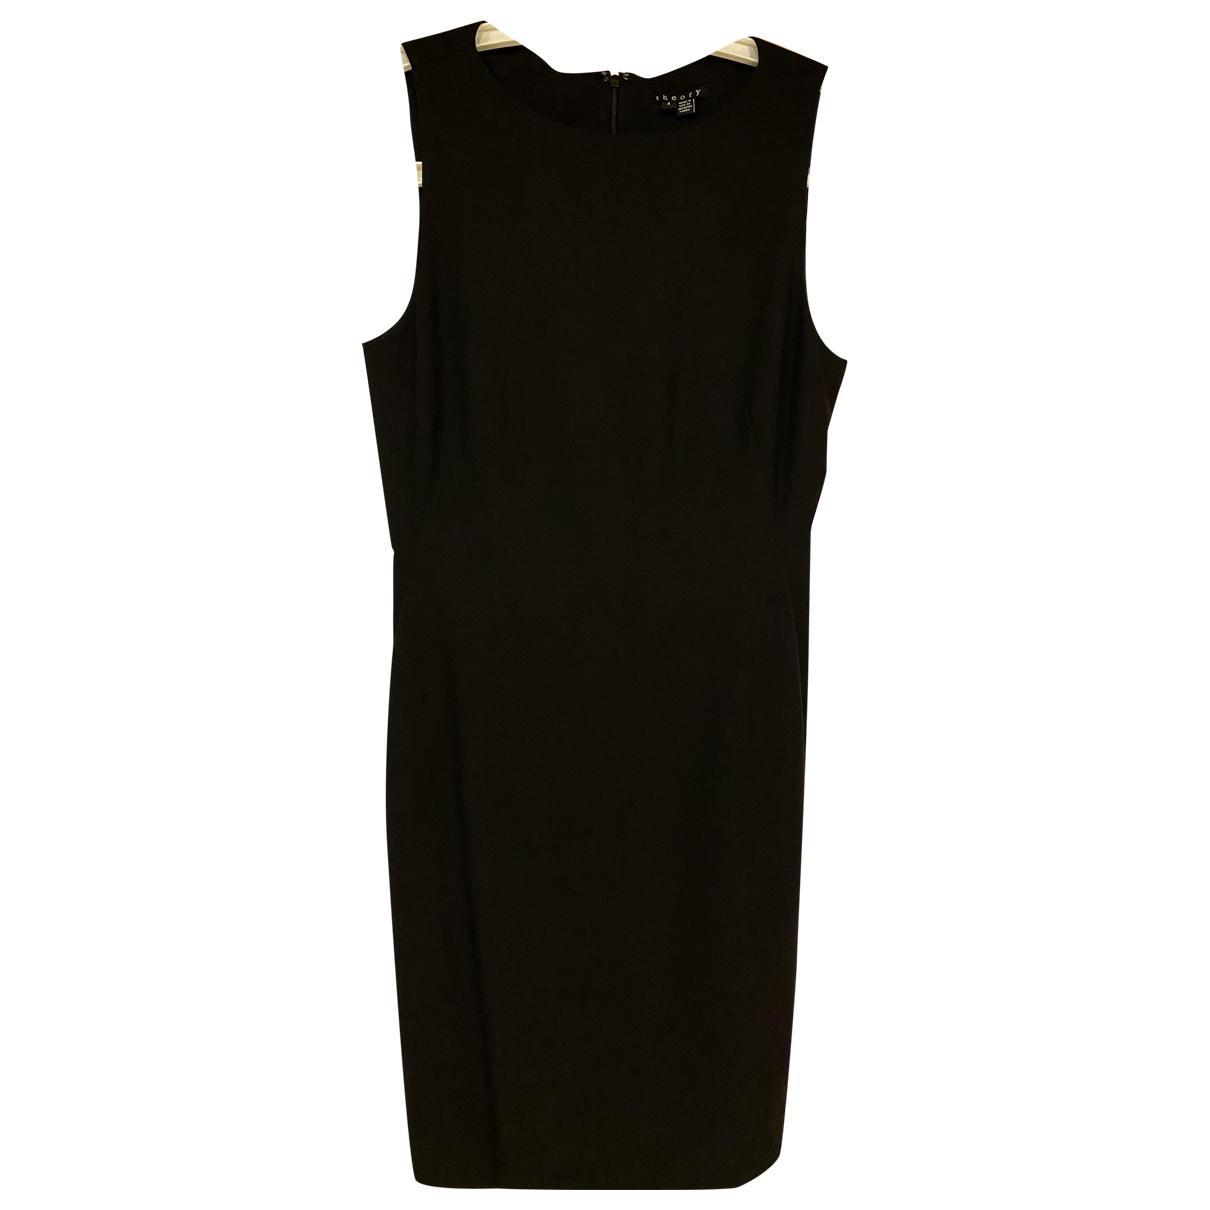 Theory \N Black Wool dress for Women 4 US